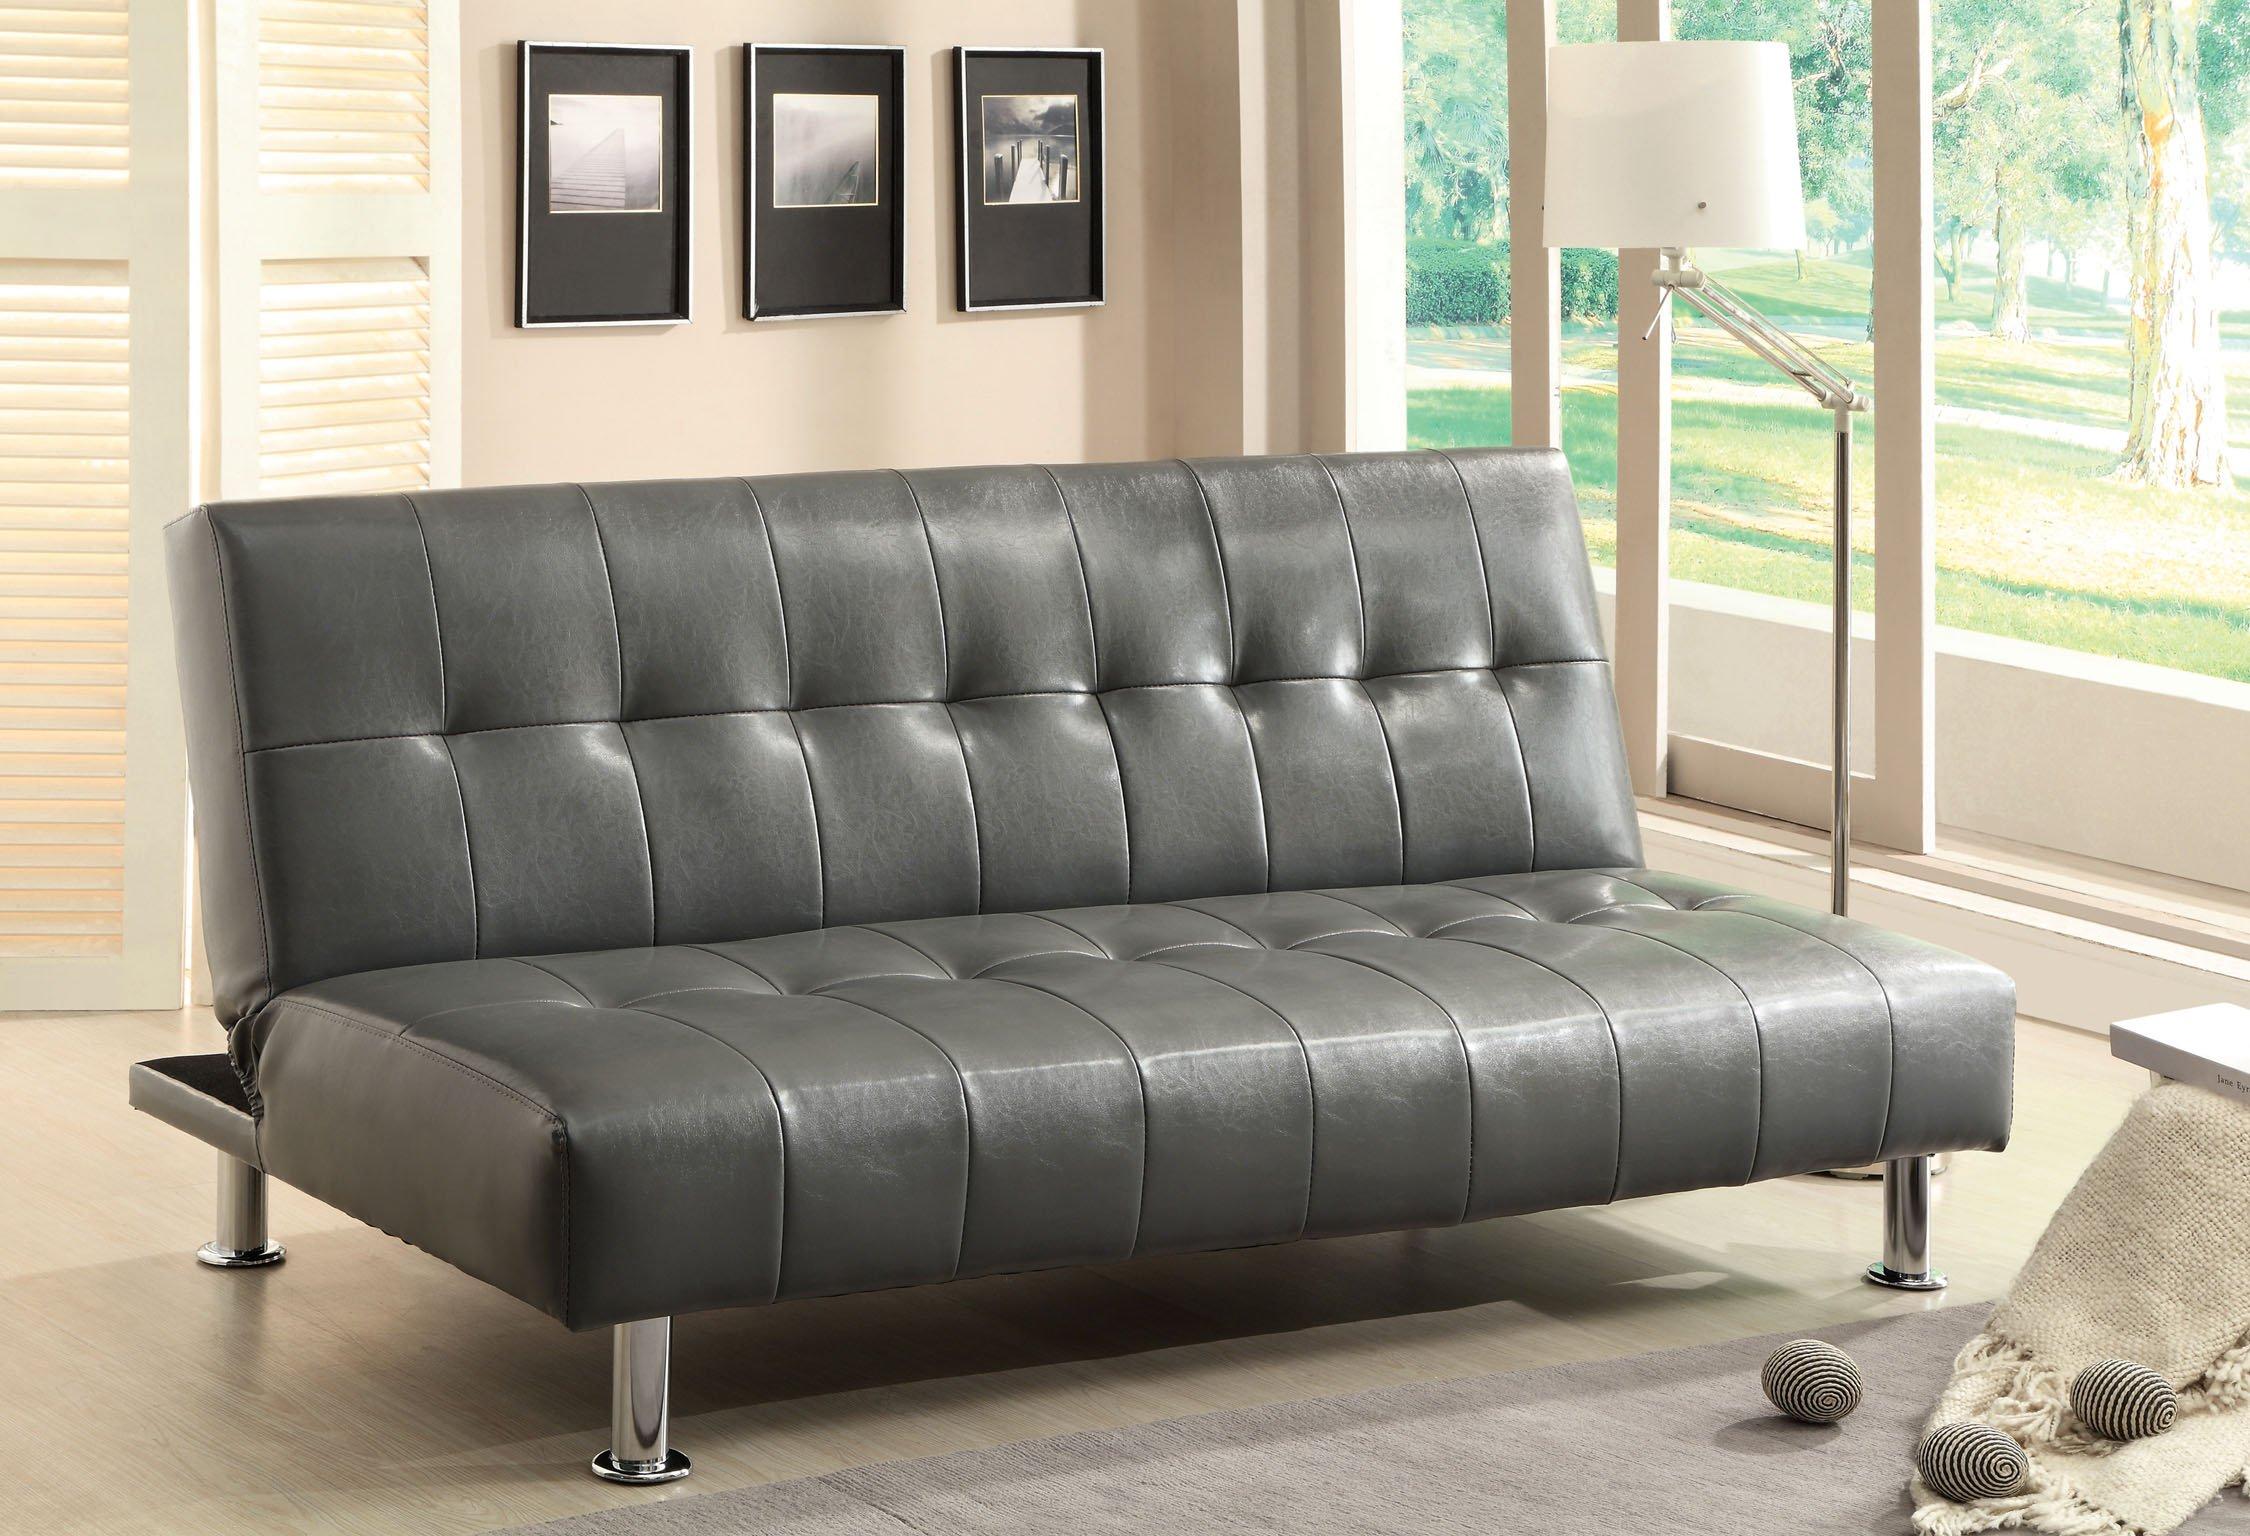 Furniture of America Botany Leatherette Convertible Sofa, Gray